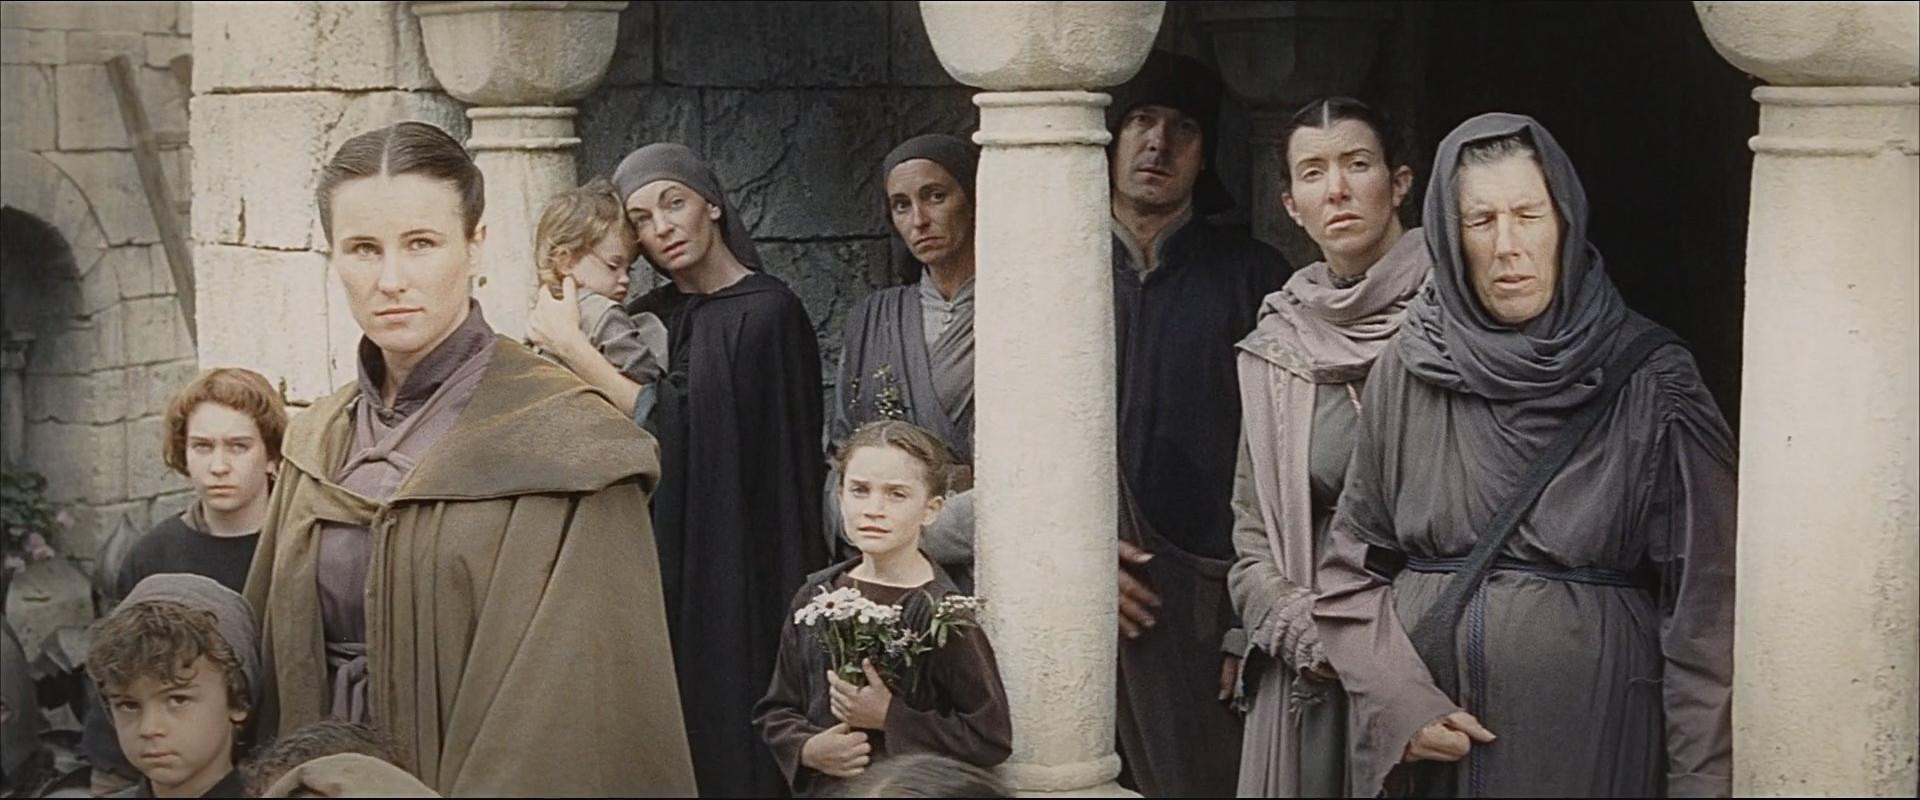 Abitanti di Minas Tirith